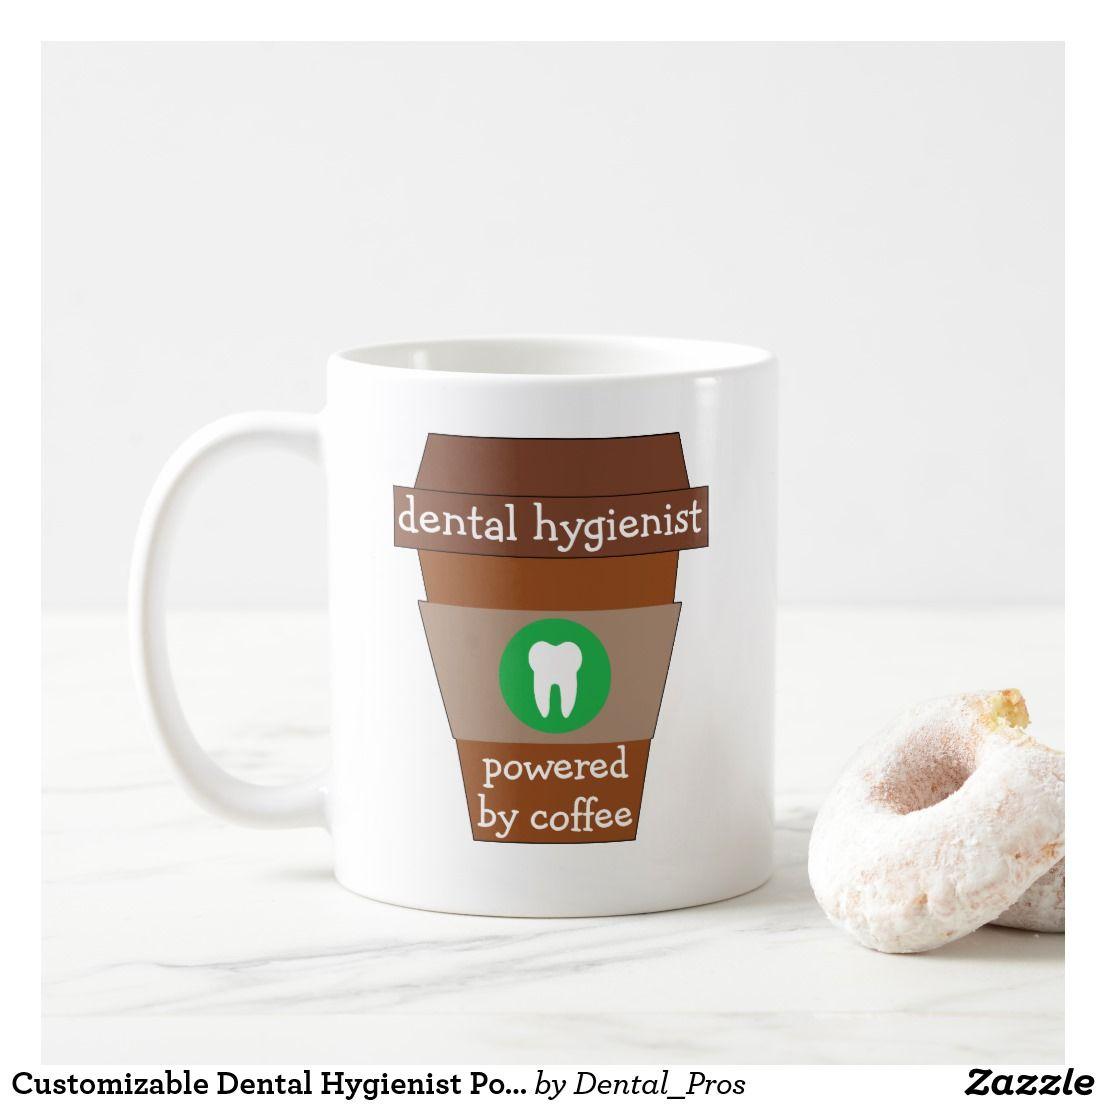 Customizable Dental Hygienist Powered By Coffee Coffee Mug | Zazzle.com #mugdisplay